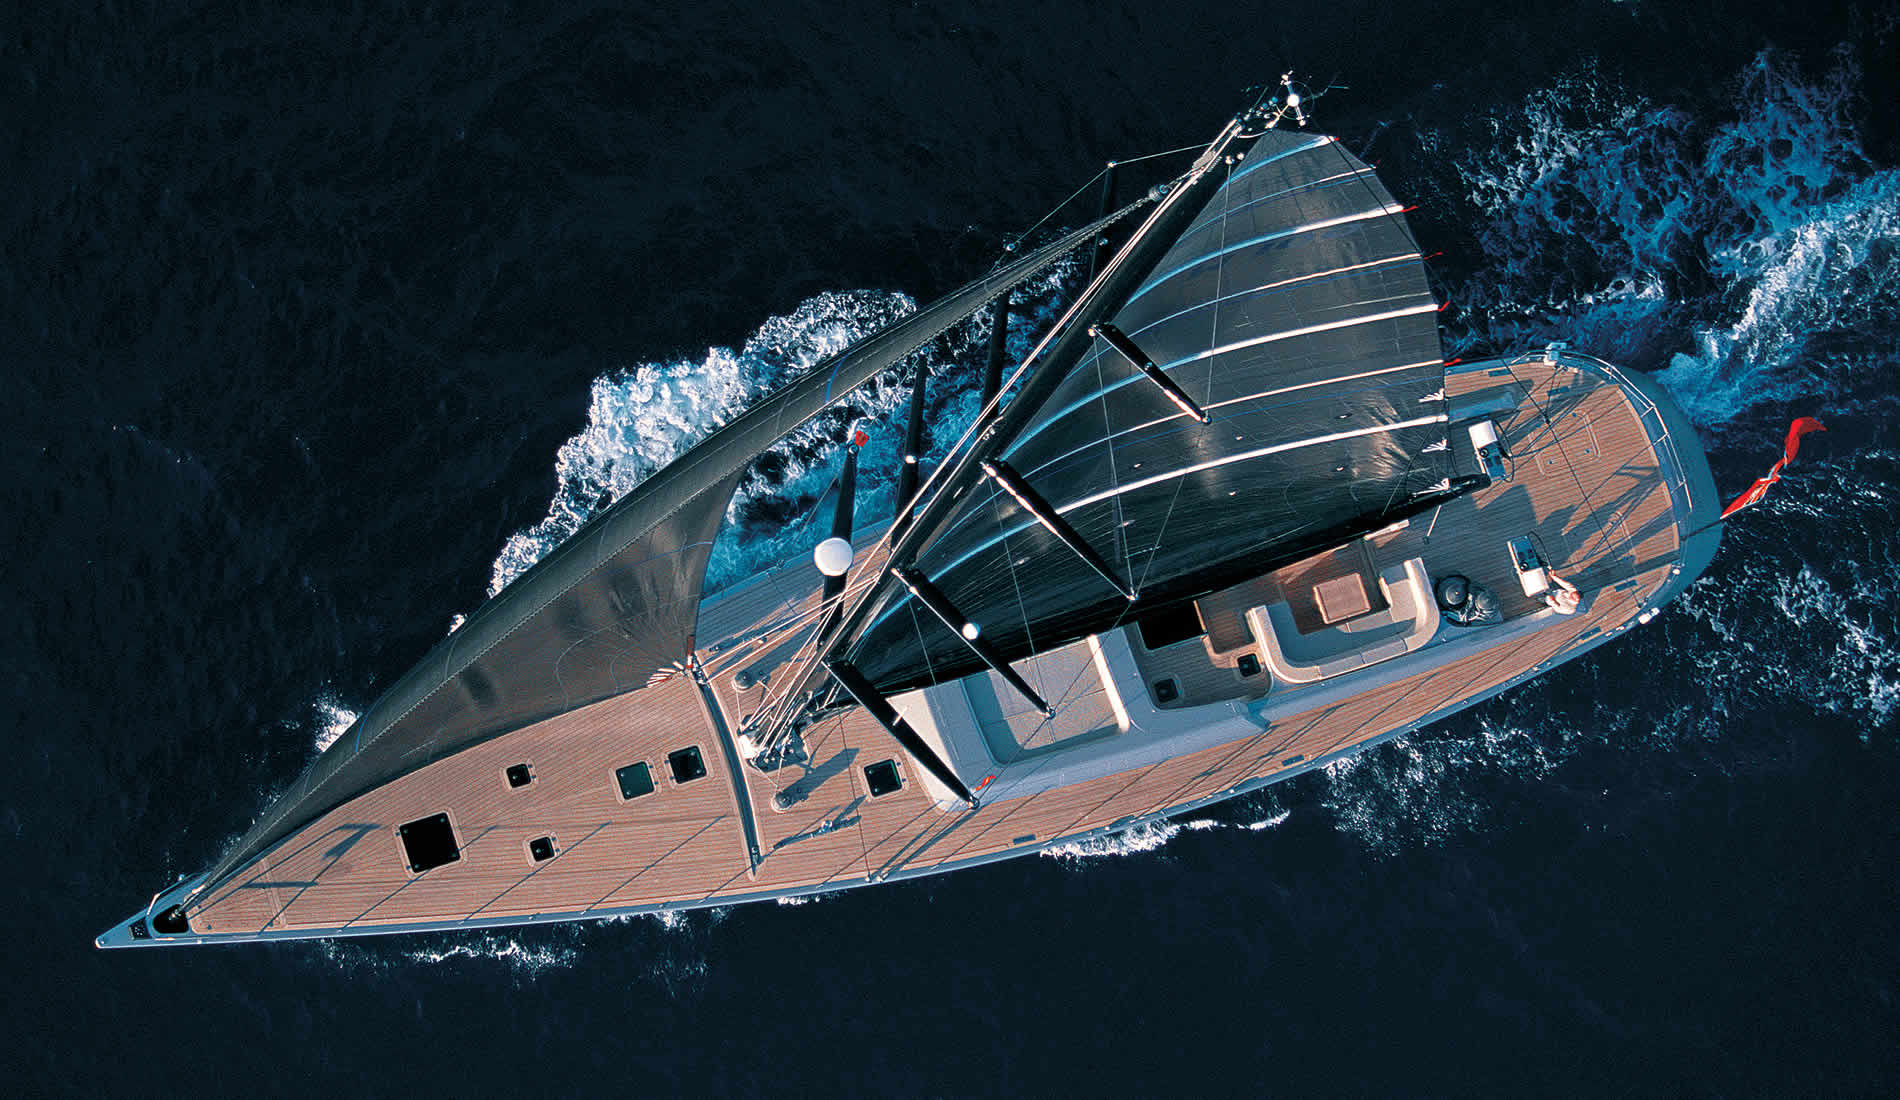 DARK SHADOW Yacht Charter Details Wally CHARTERWORLD Luxury Superyachts